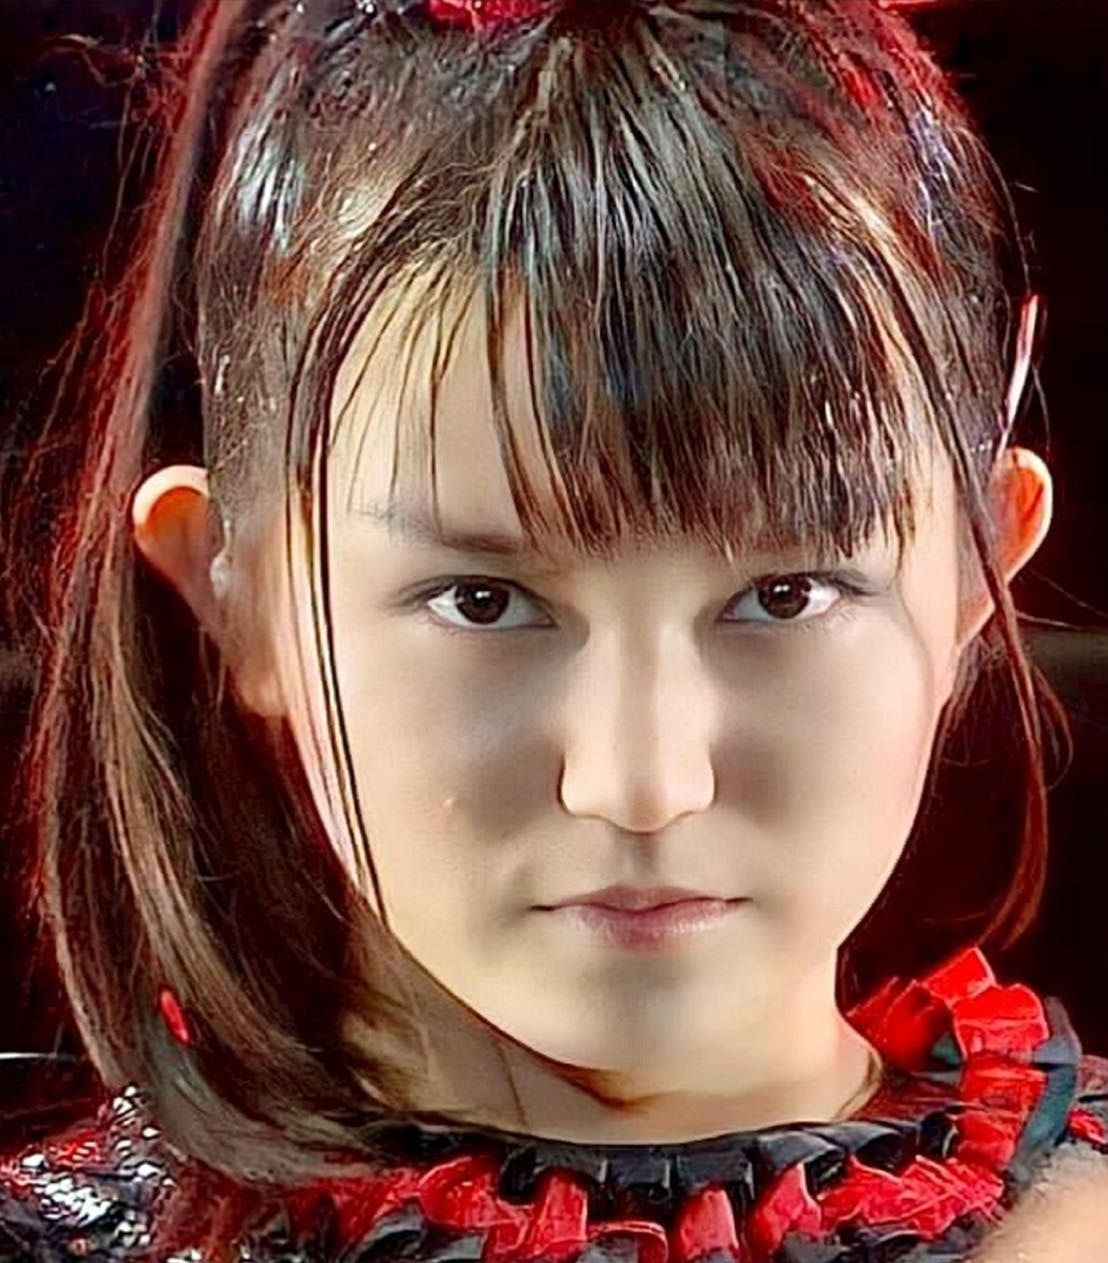 BABYMETAL (SU-METAL) Suzuka Nakamoto 中元すず香 in 2021